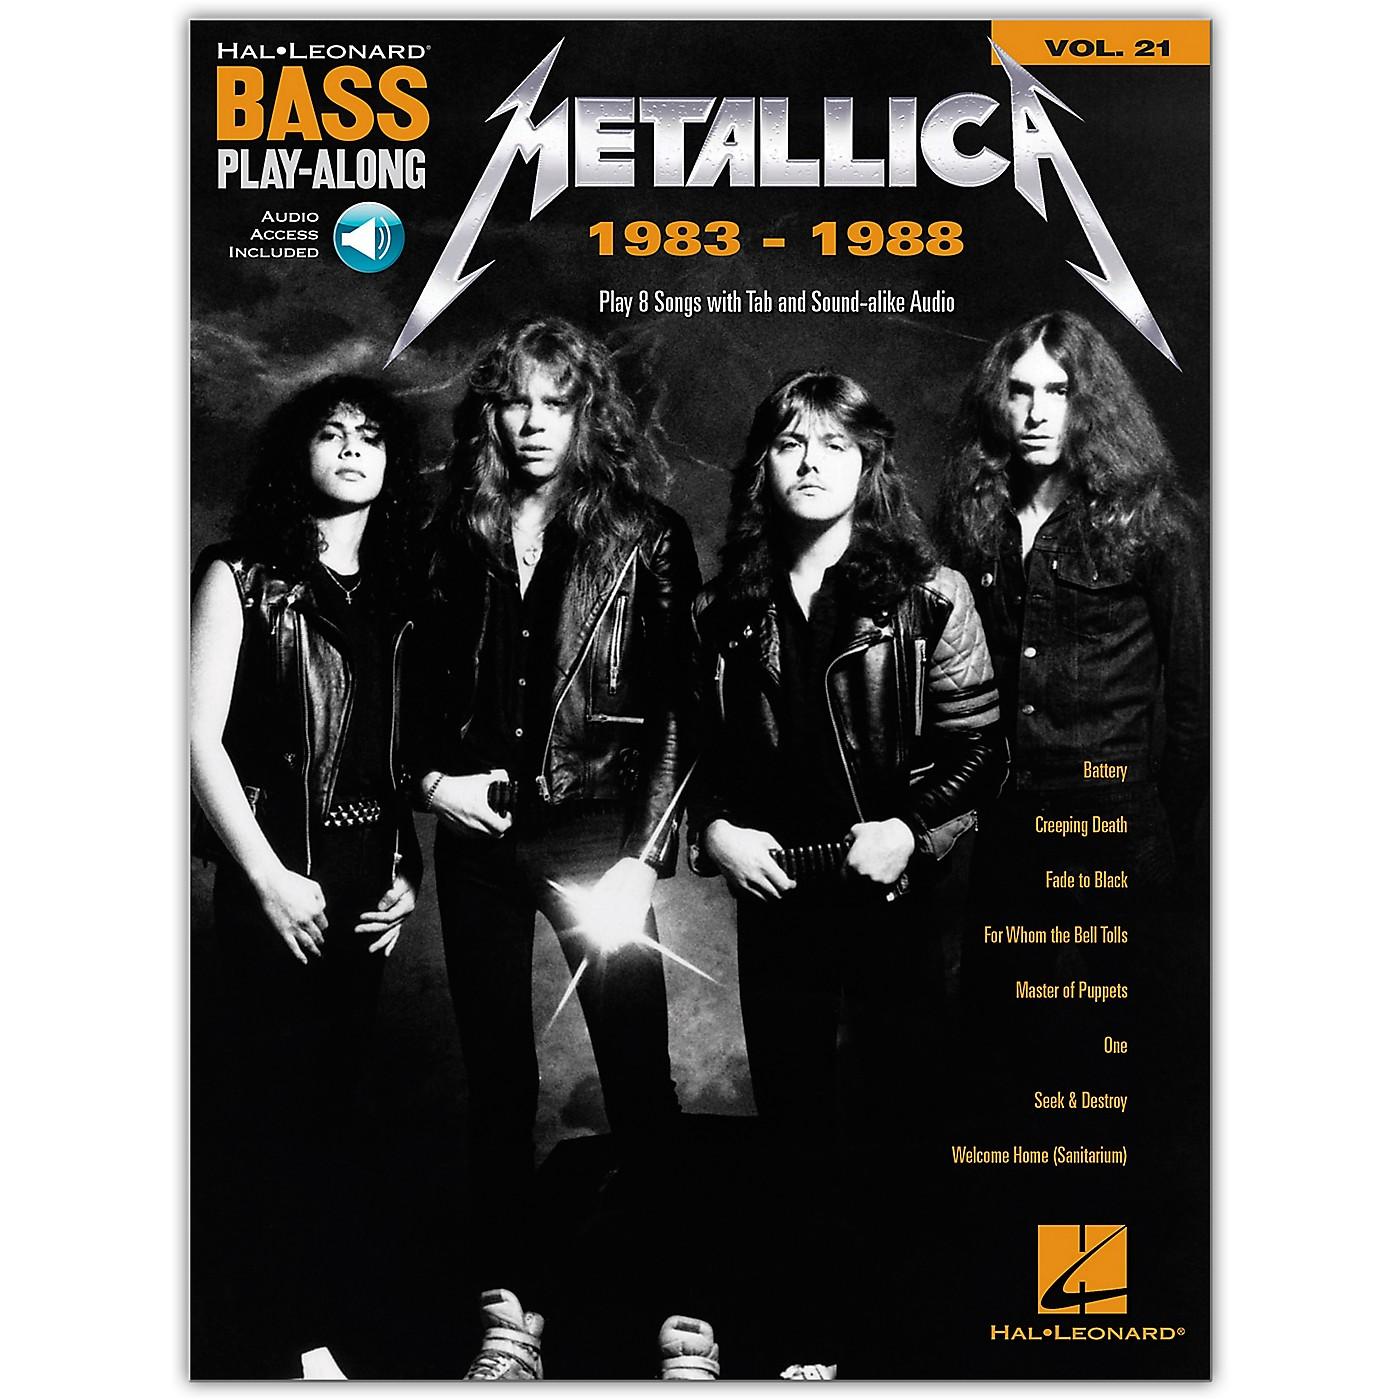 Hal Leonard Metallica: 1983-1988 Bass Play-Along Volume 21 Book/Audio Online thumbnail